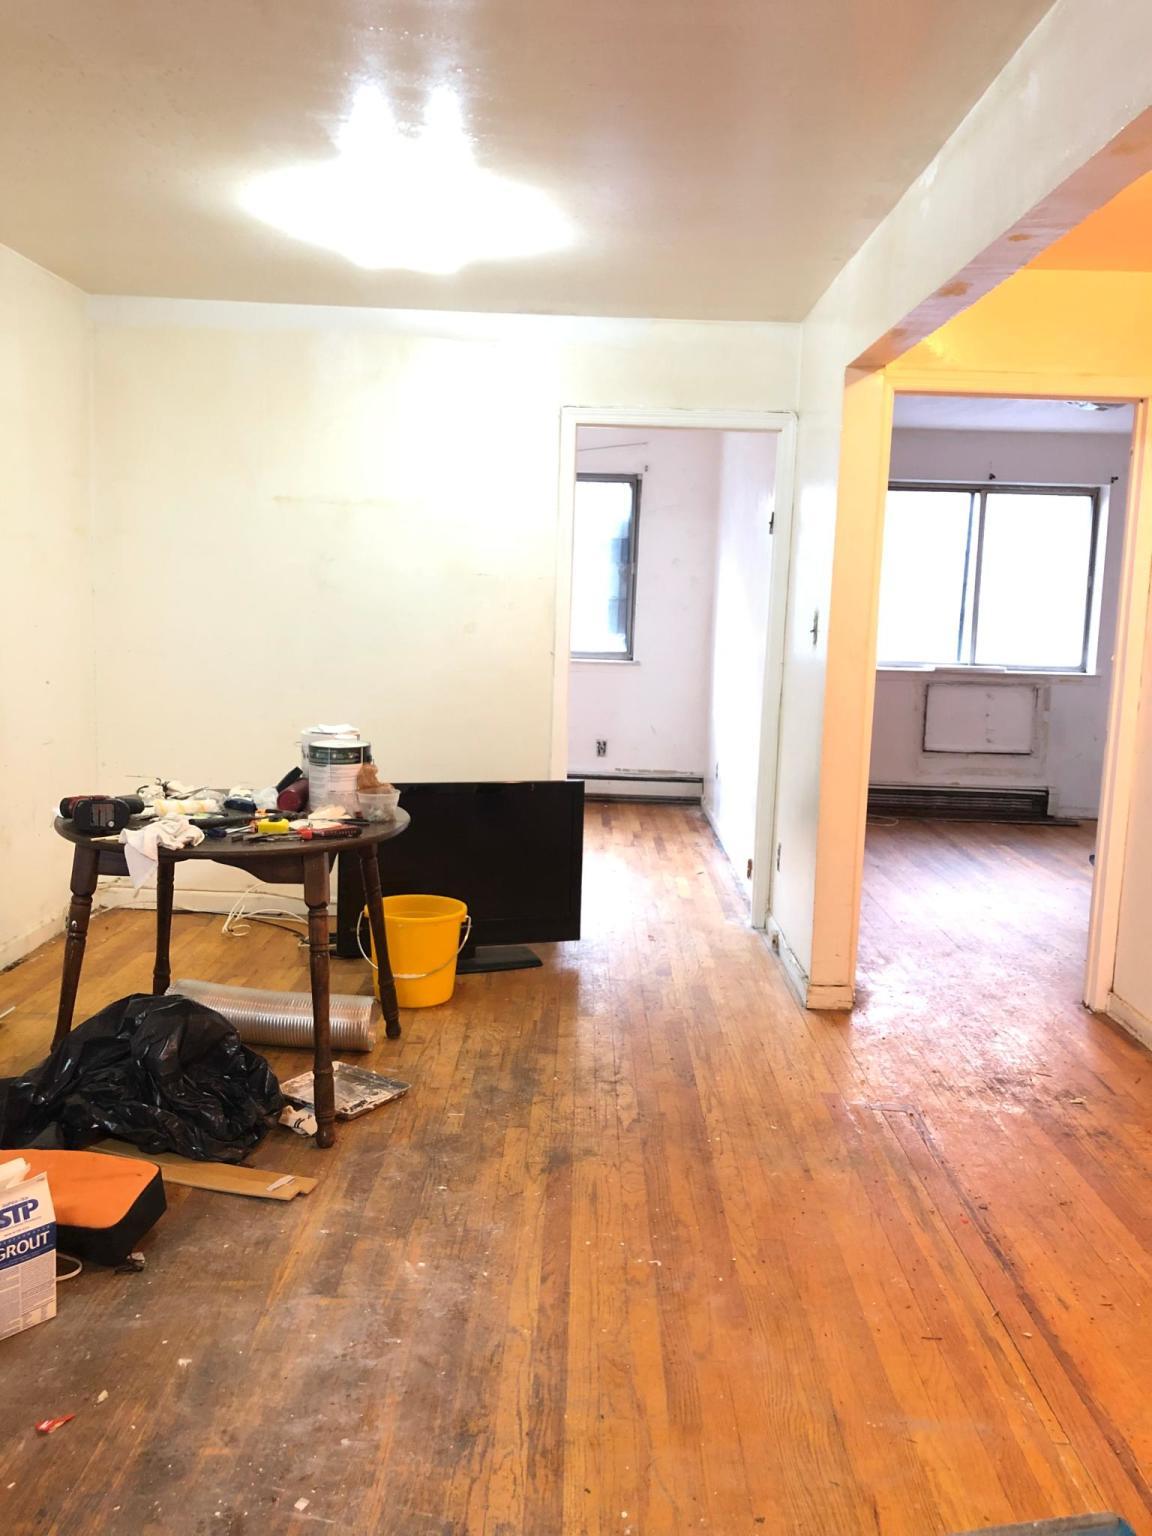 5610 138th St #1, Flushing, NY 11355 - 2 Bed, 1 Bath - 5